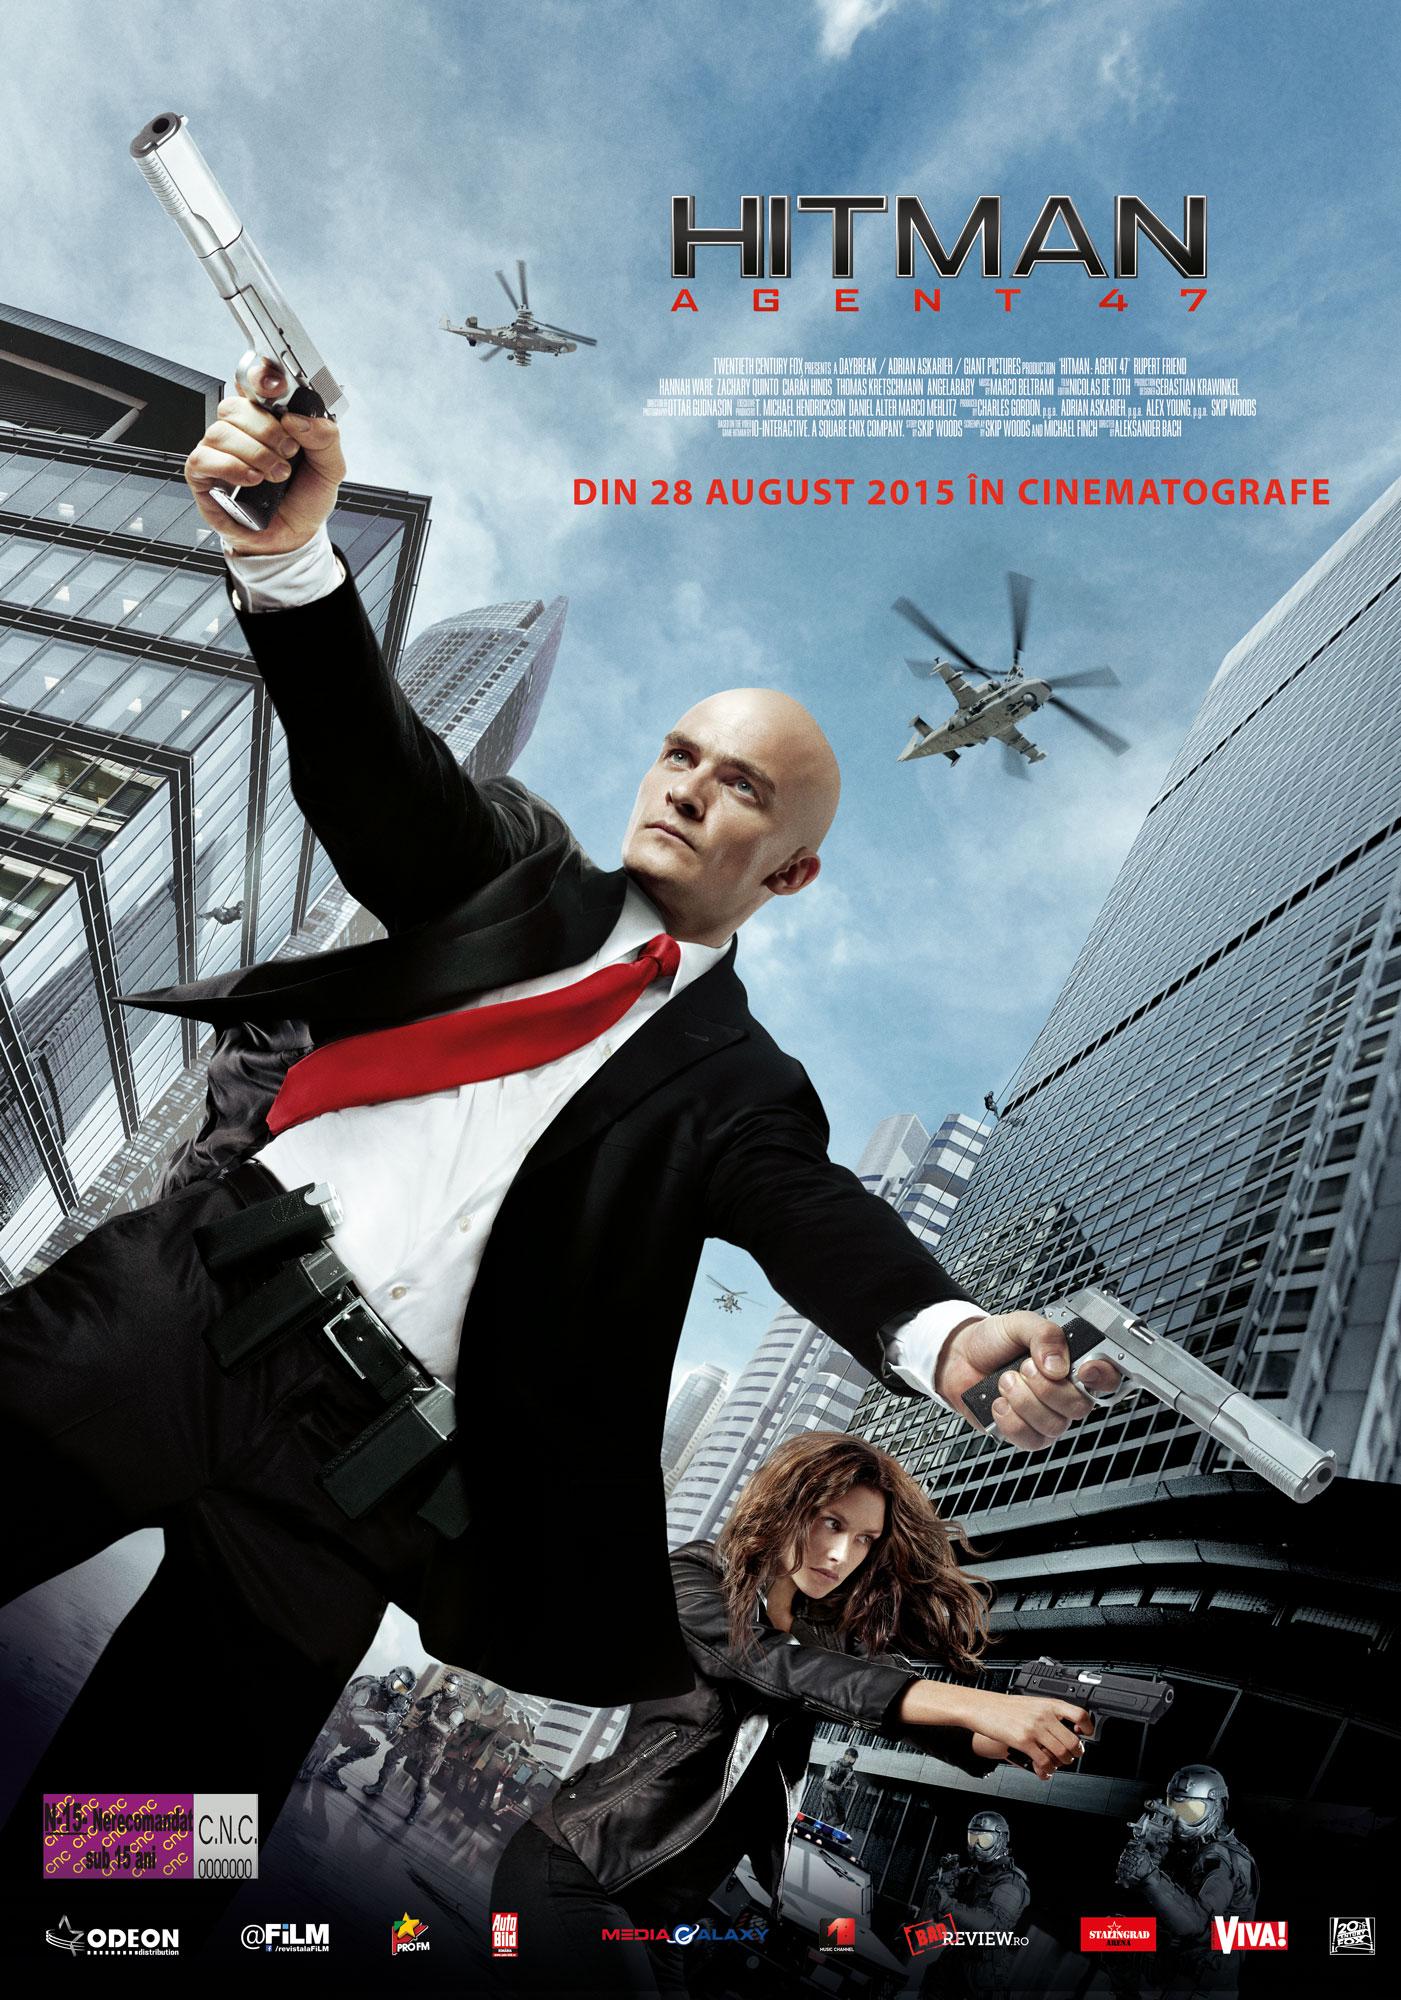 Hitman: Agent 47 (2015) Hitman-agent-47-304037l